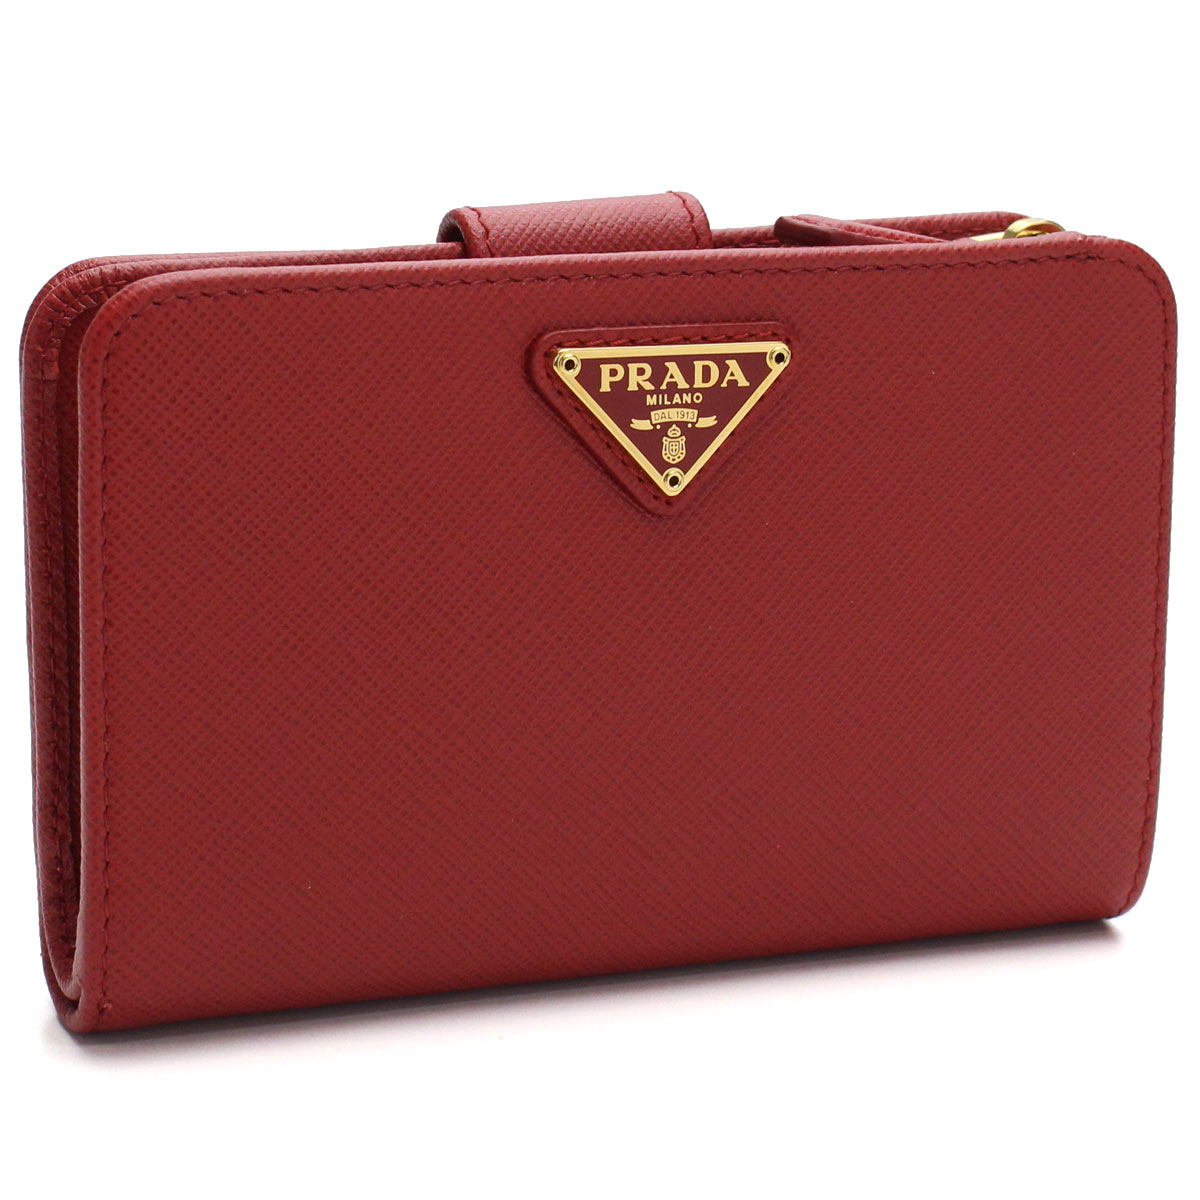 68e1f4edf8a20 Bighit The total brand wholesale  Prada PRADA wallet folio compact wallet  1ML225 QHH F068Z FUOCO red system